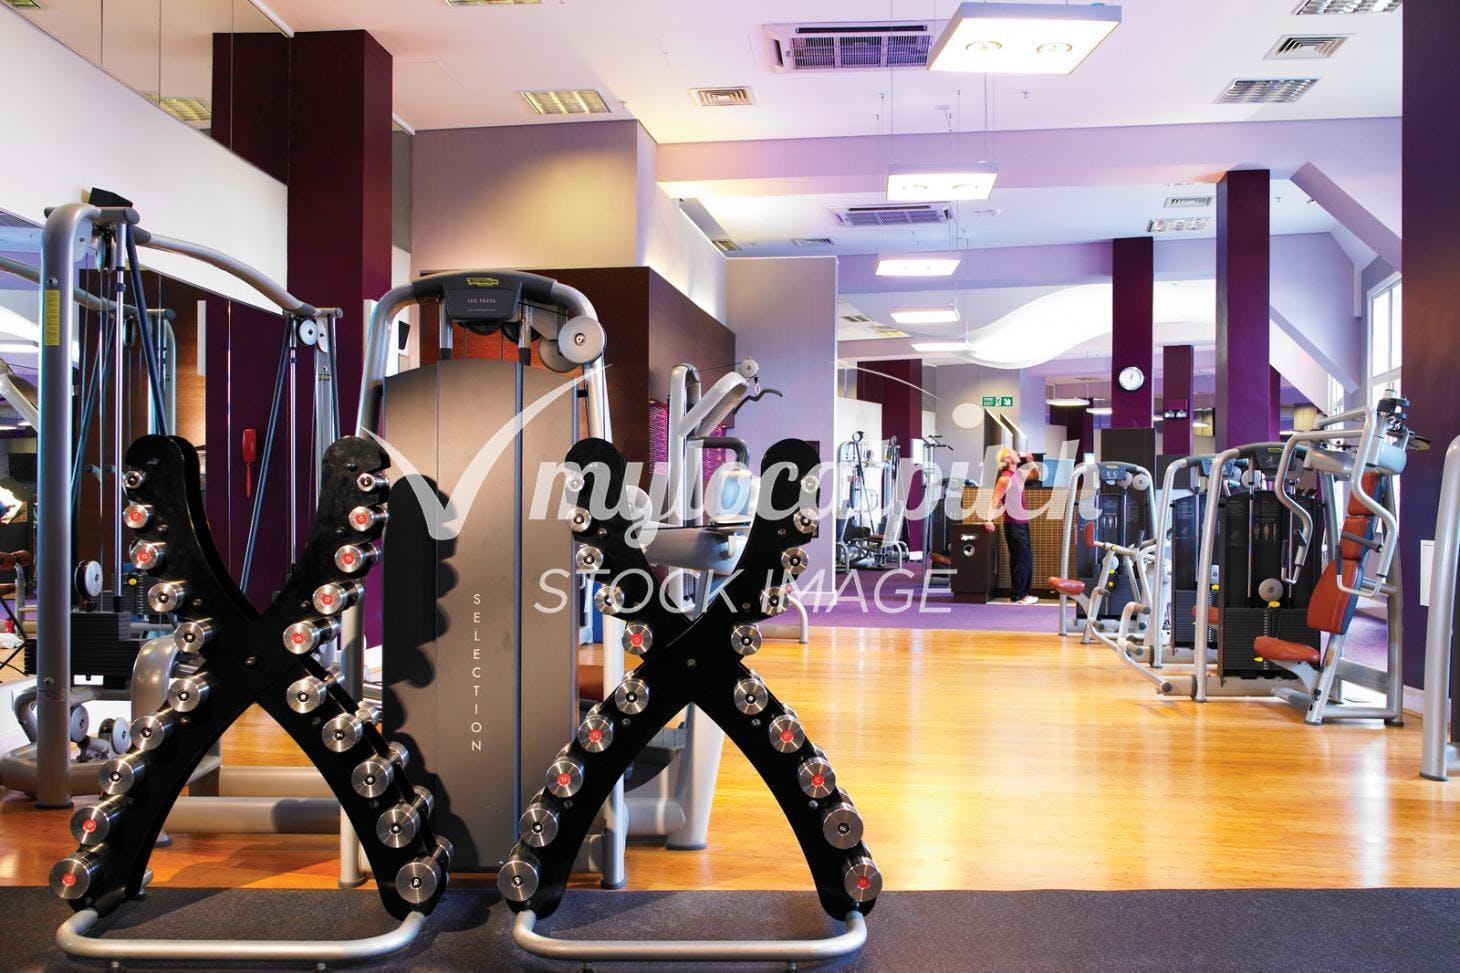 The King's Club Gym gym